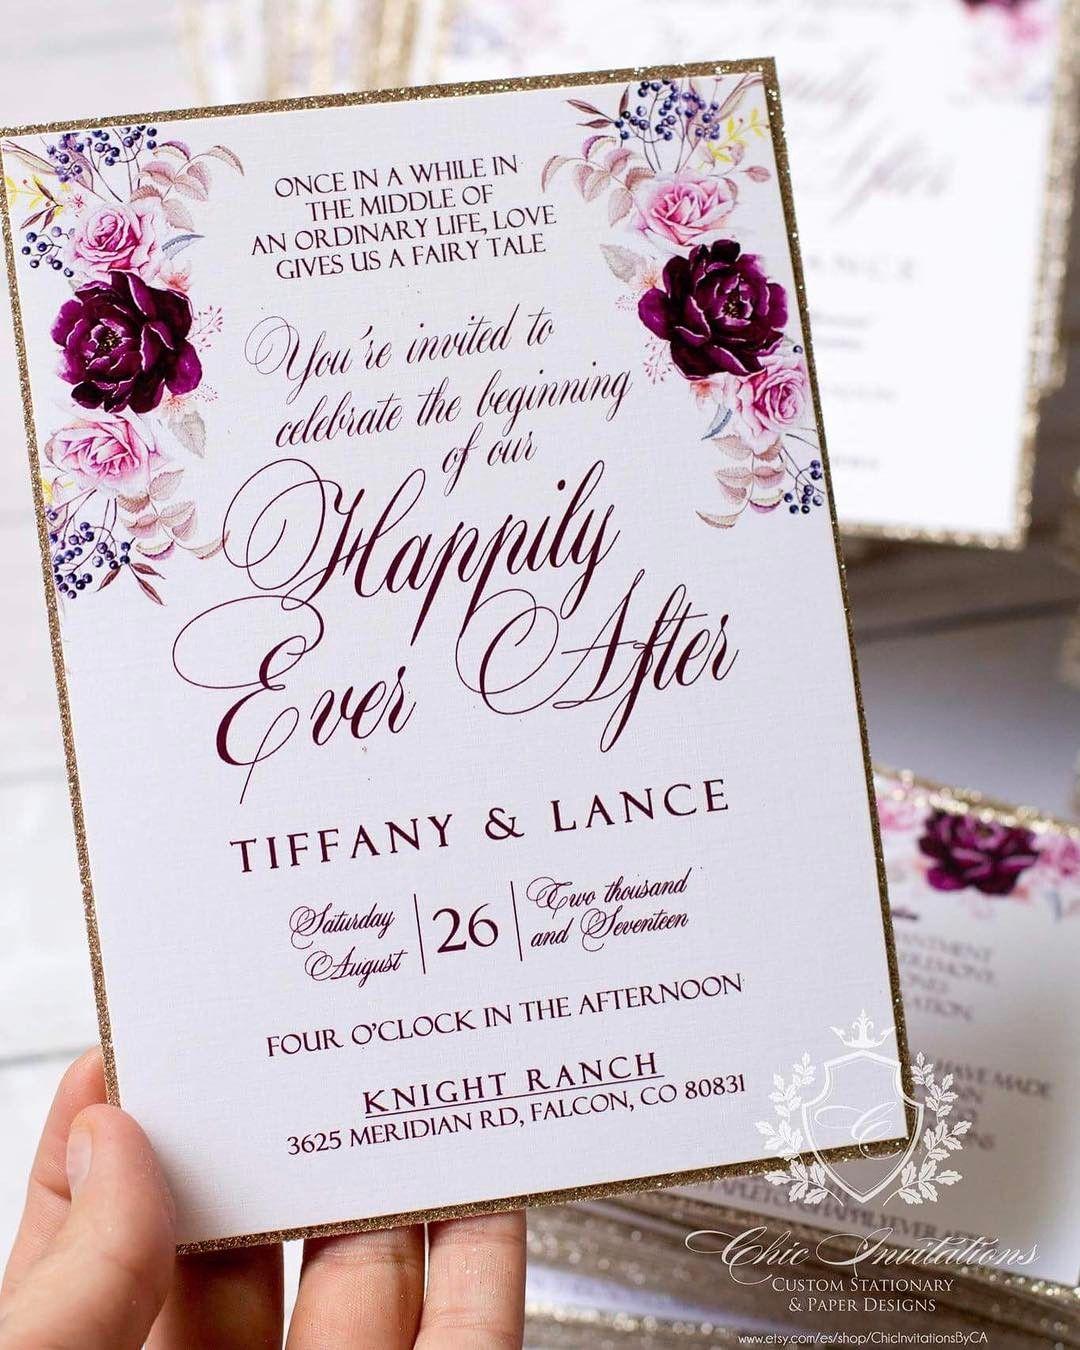 Wedding Invitations Fresno Ca: Finishing These Luxury Wedding Invitations